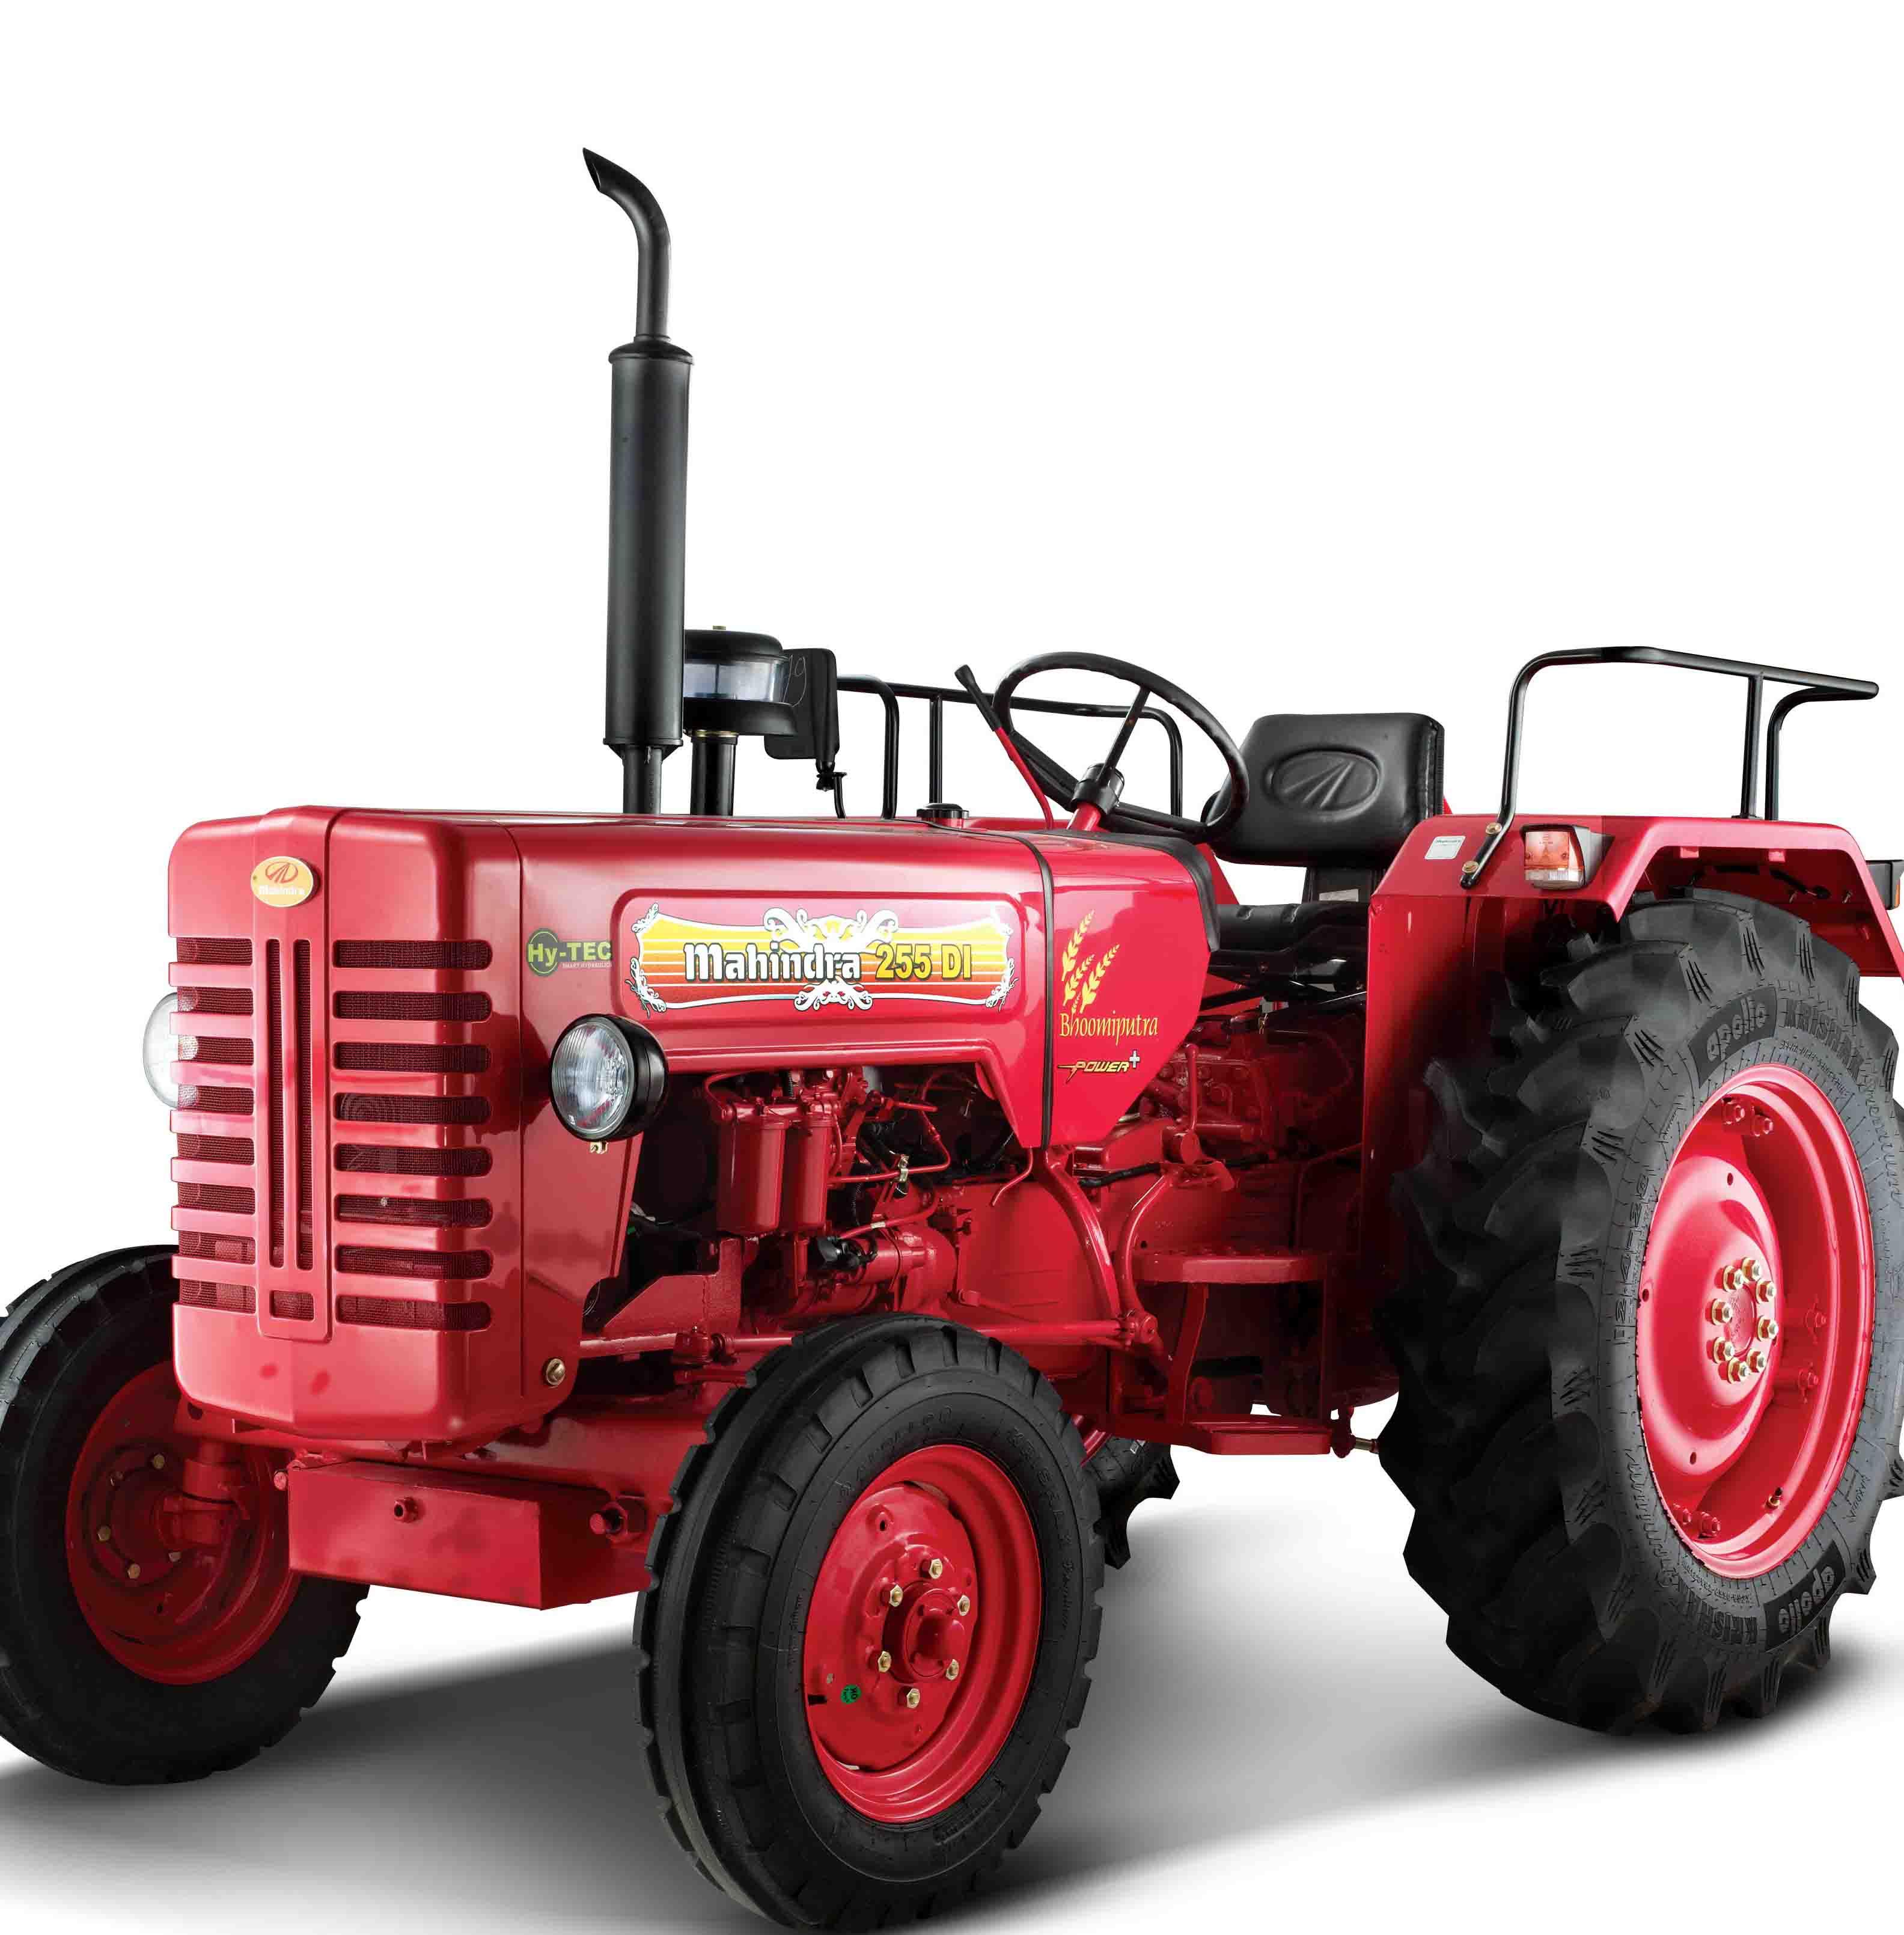 Mahindra Tractors Launches The New Mahindra 255 Di